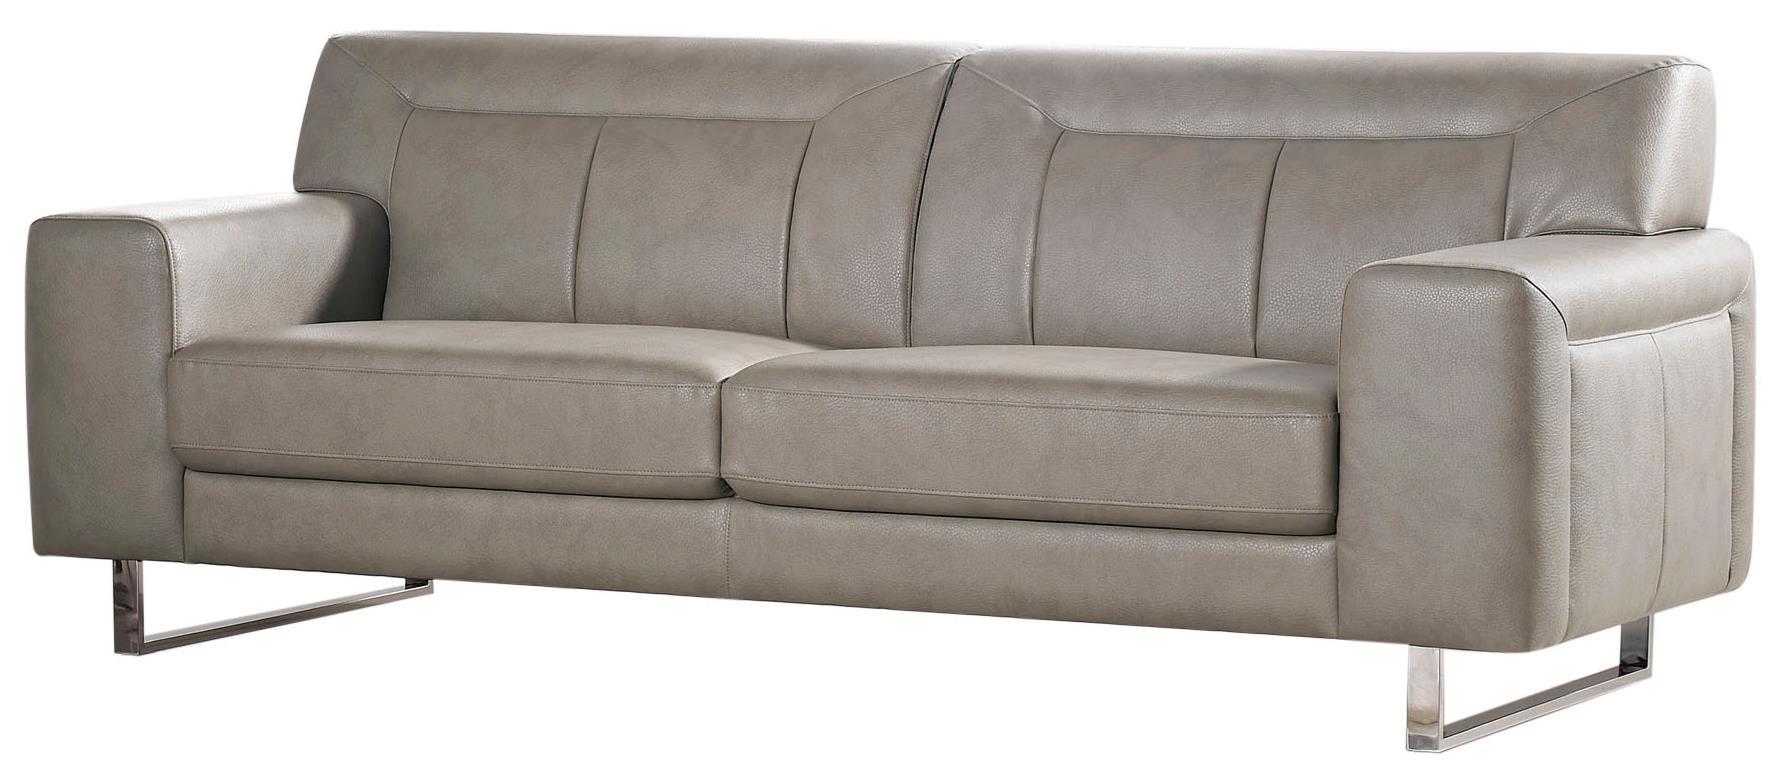 Diamond Sofa Vera Leatherette Sofa with Chrome Metal Base - Item Number: VERASOSS